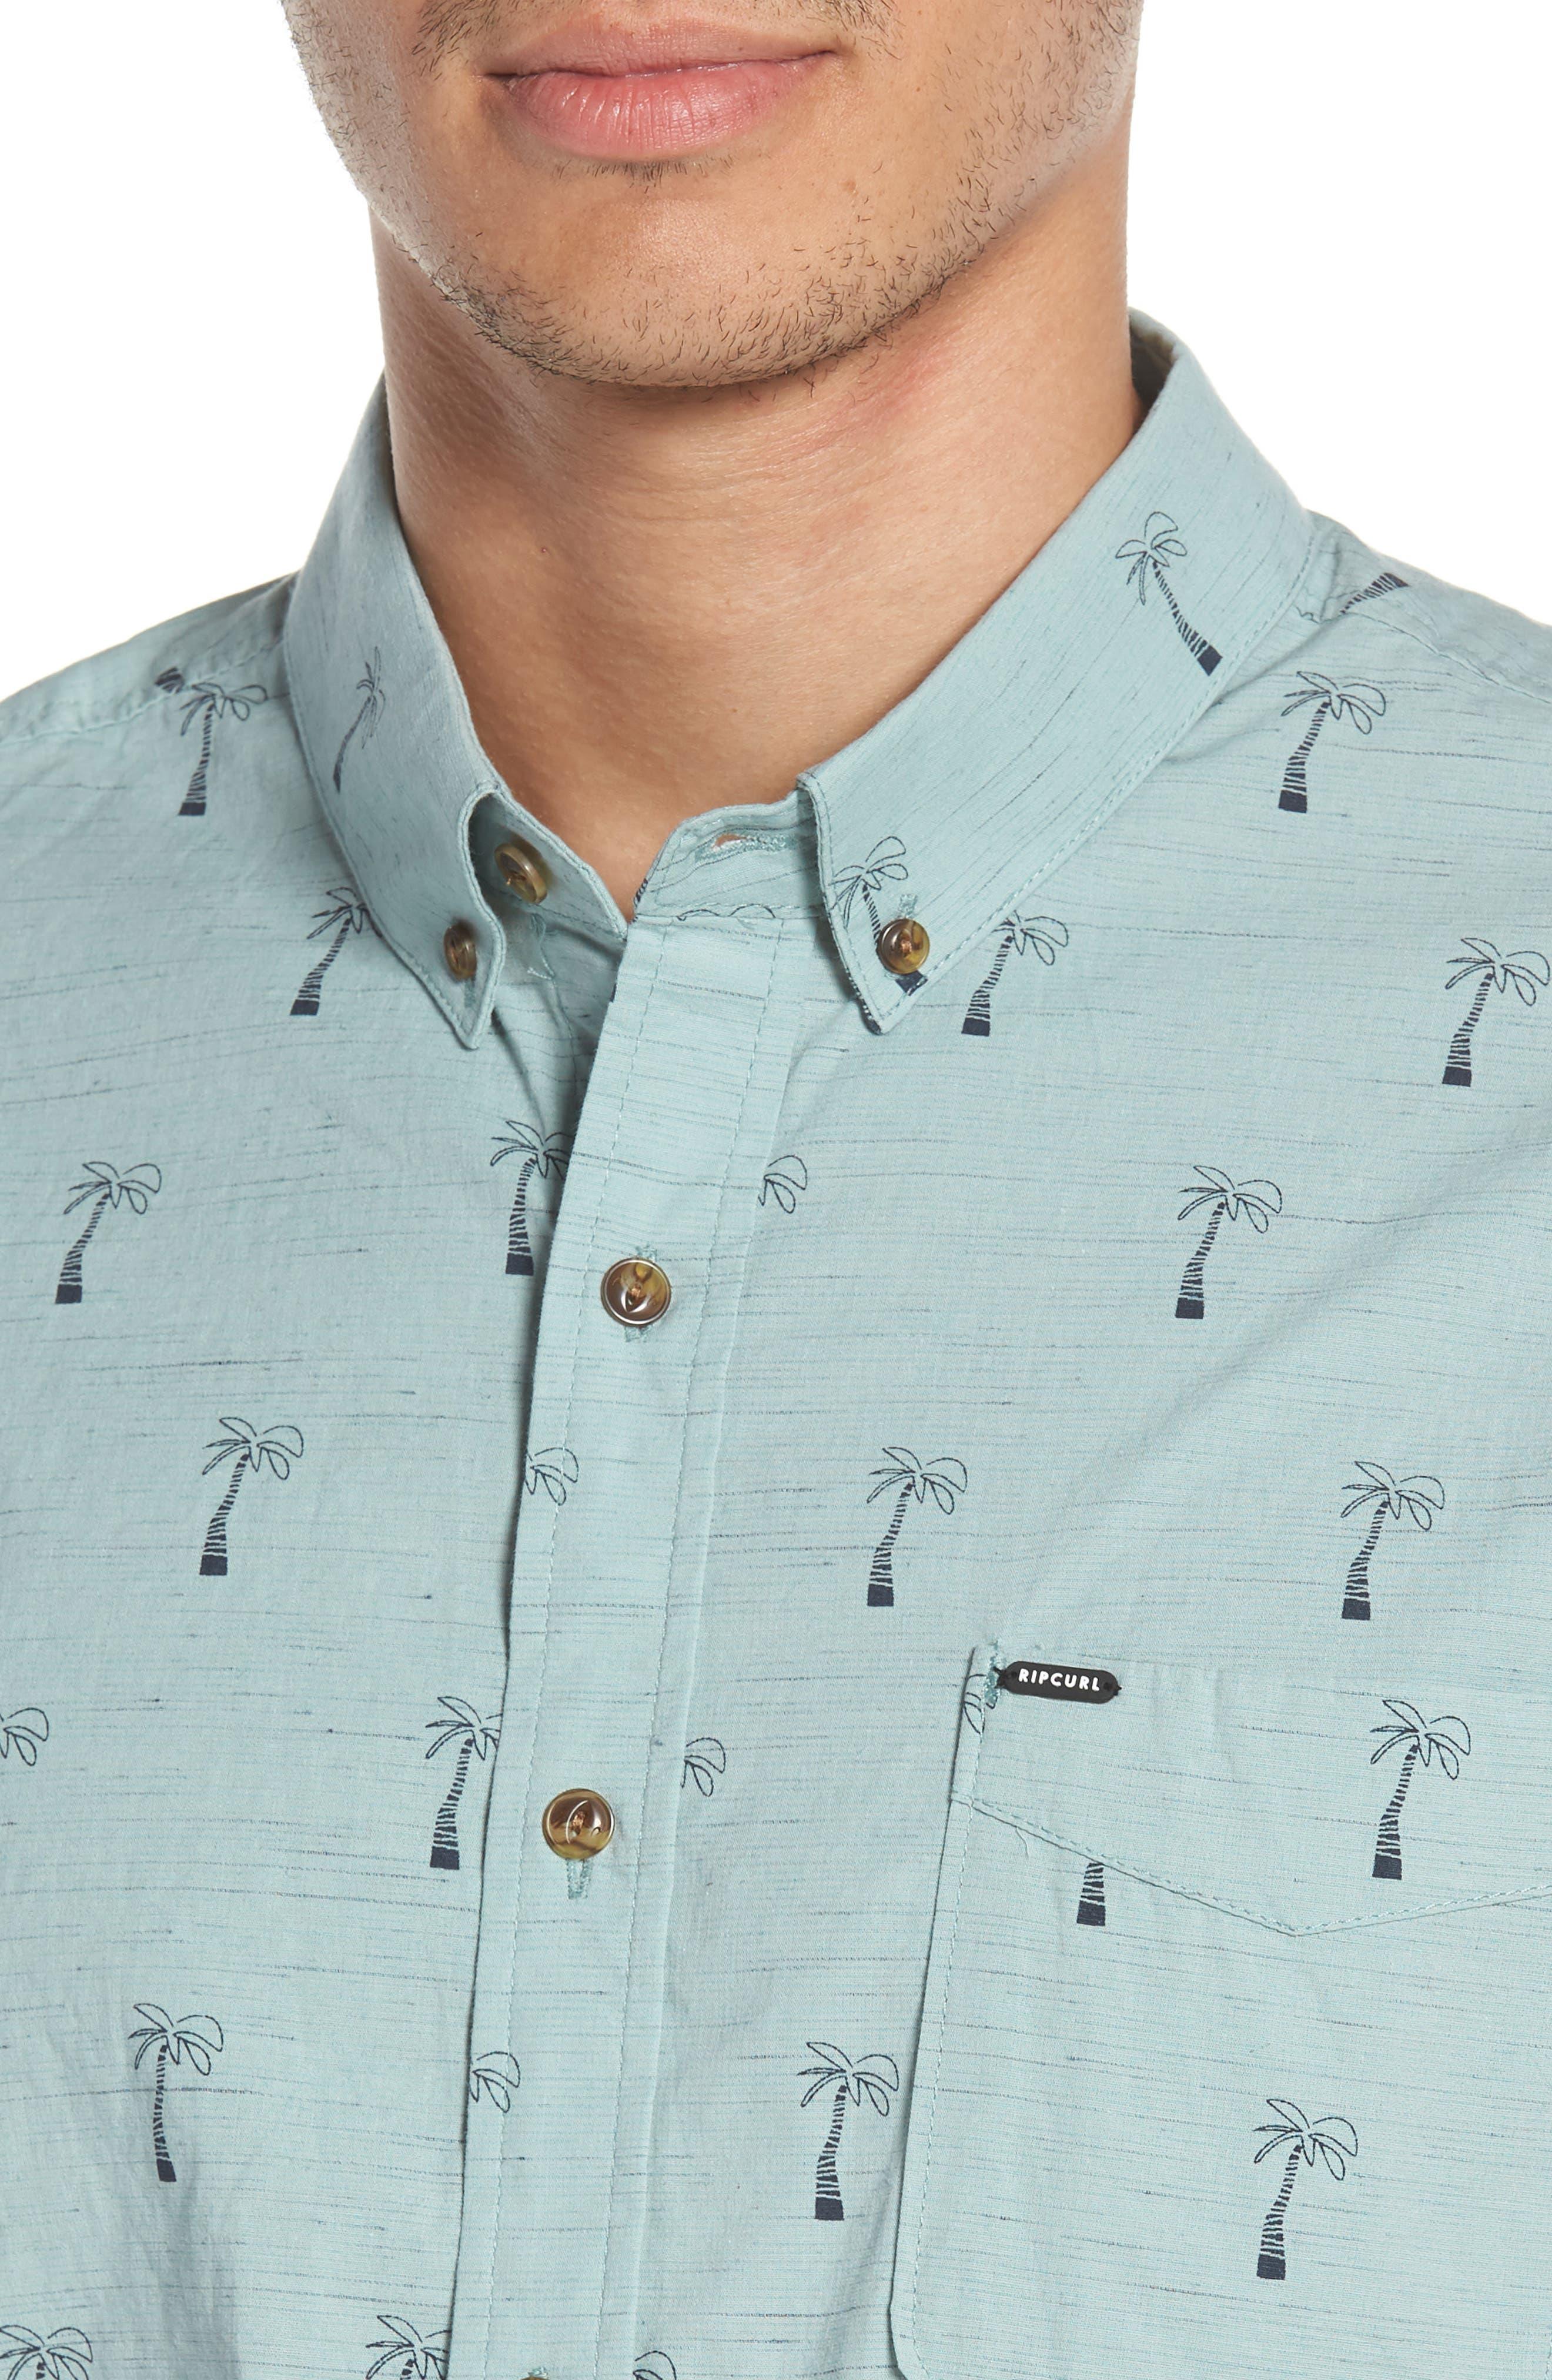 Riviera Woven Shirt,                             Alternate thumbnail 2, color,                             Aqua